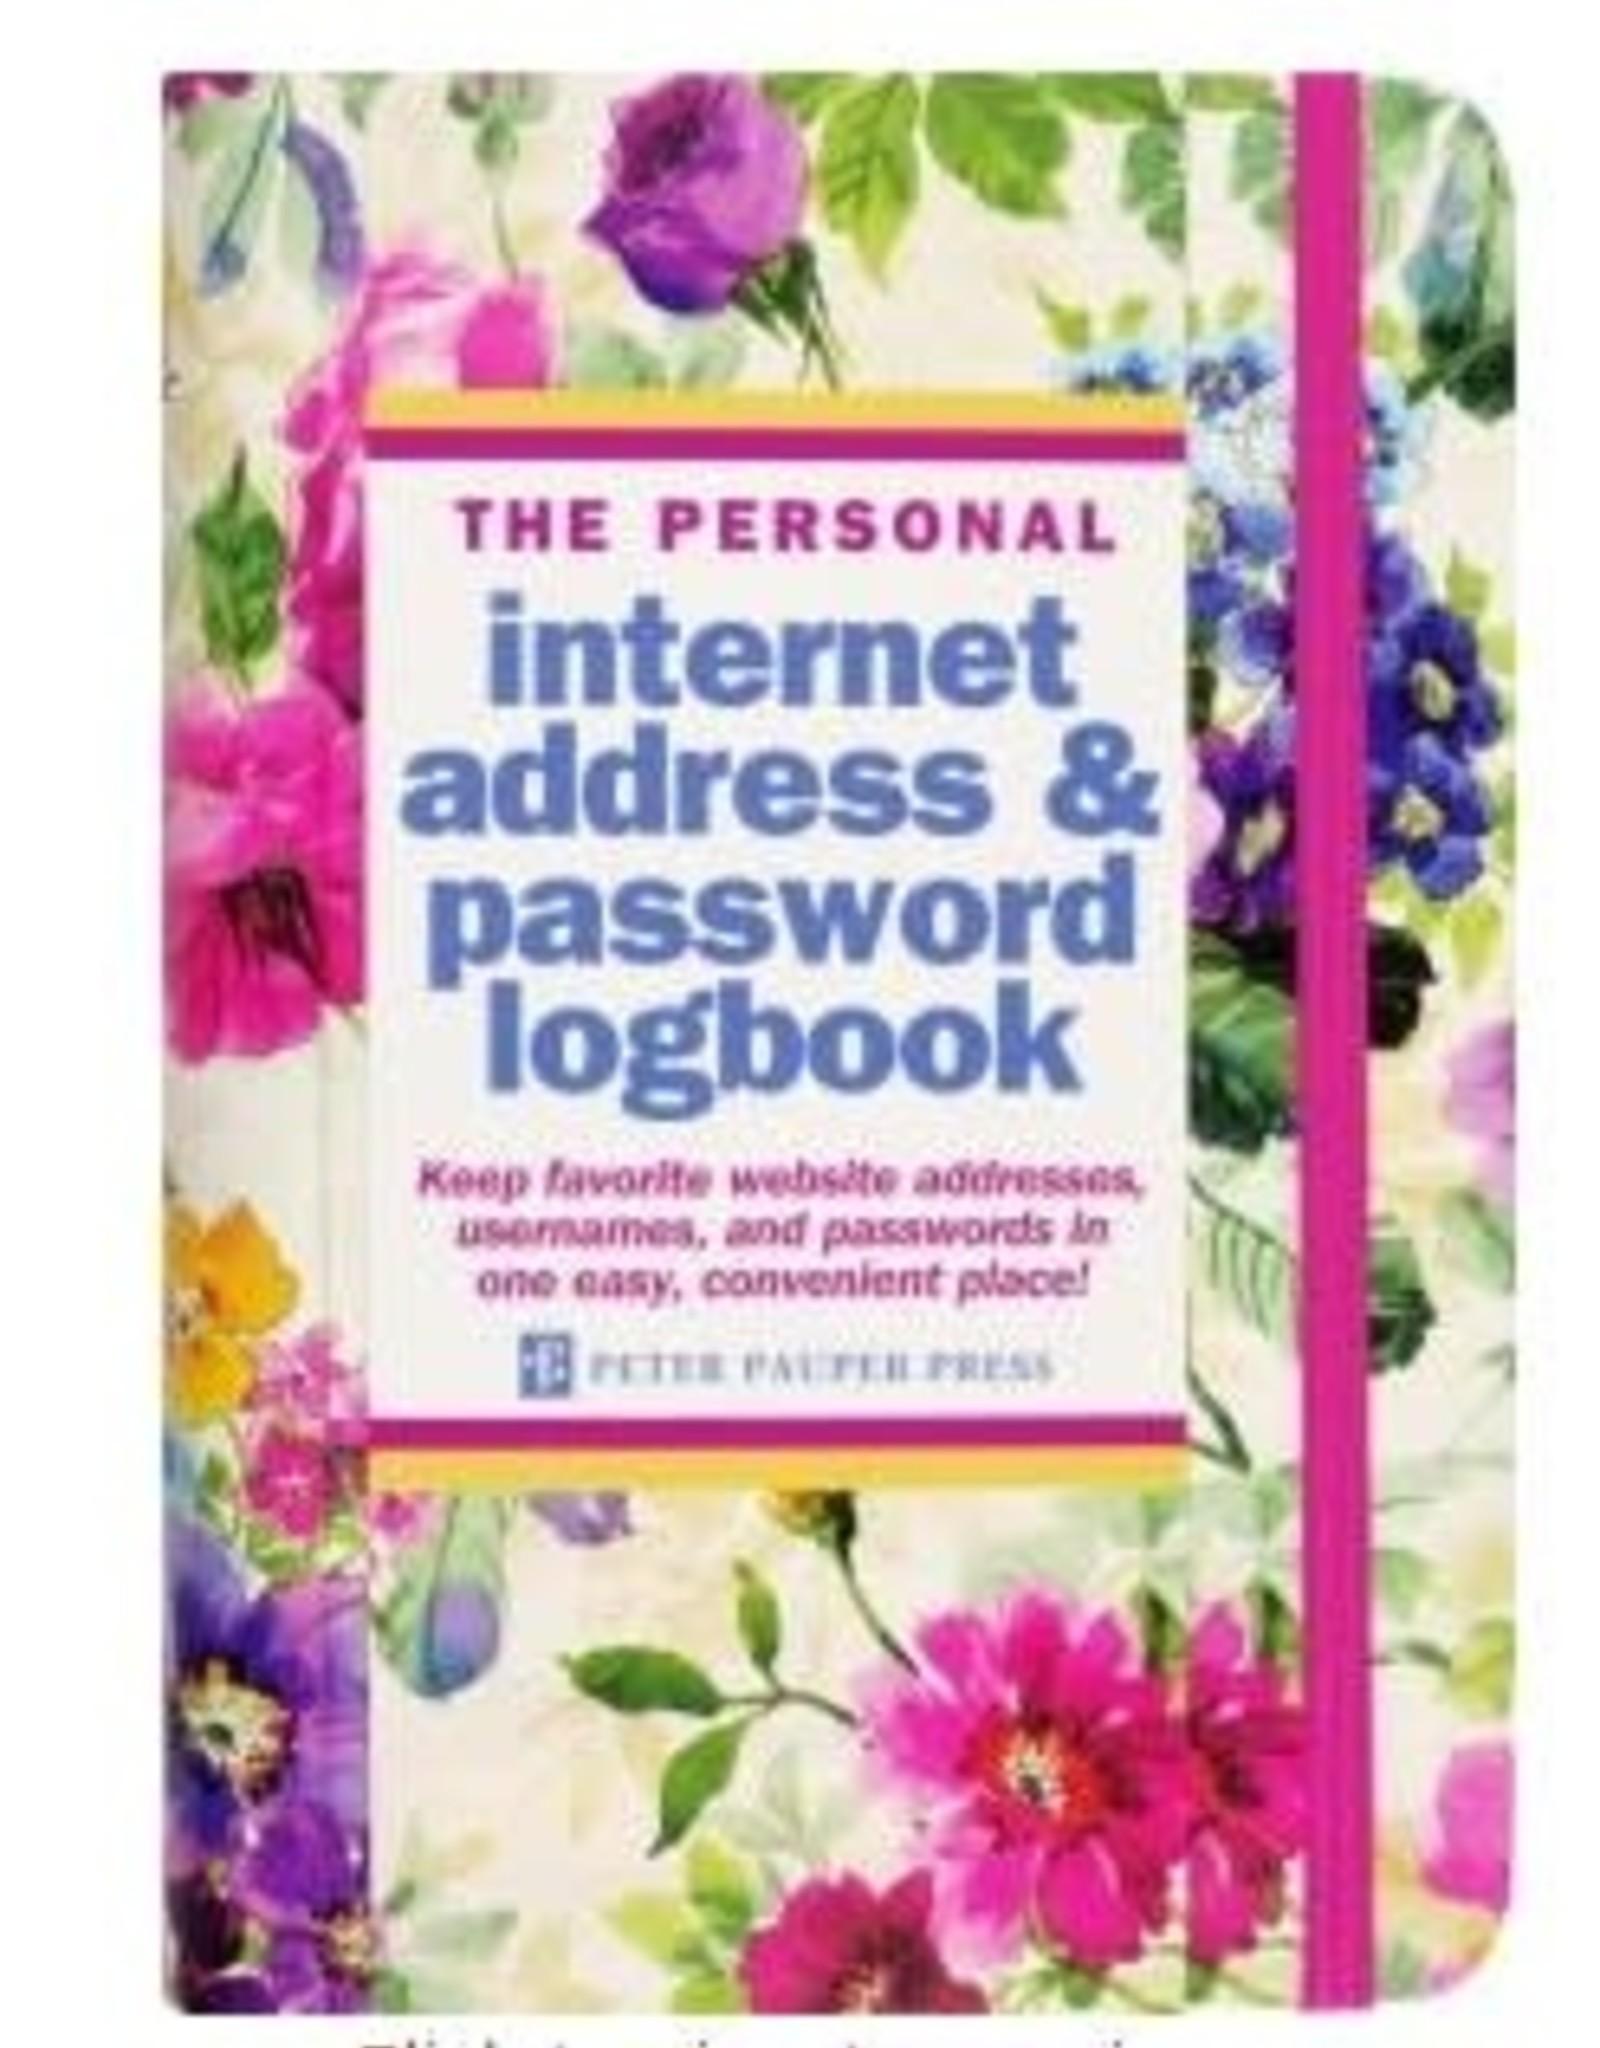 Peony Garden Internet Address & Password Logbook